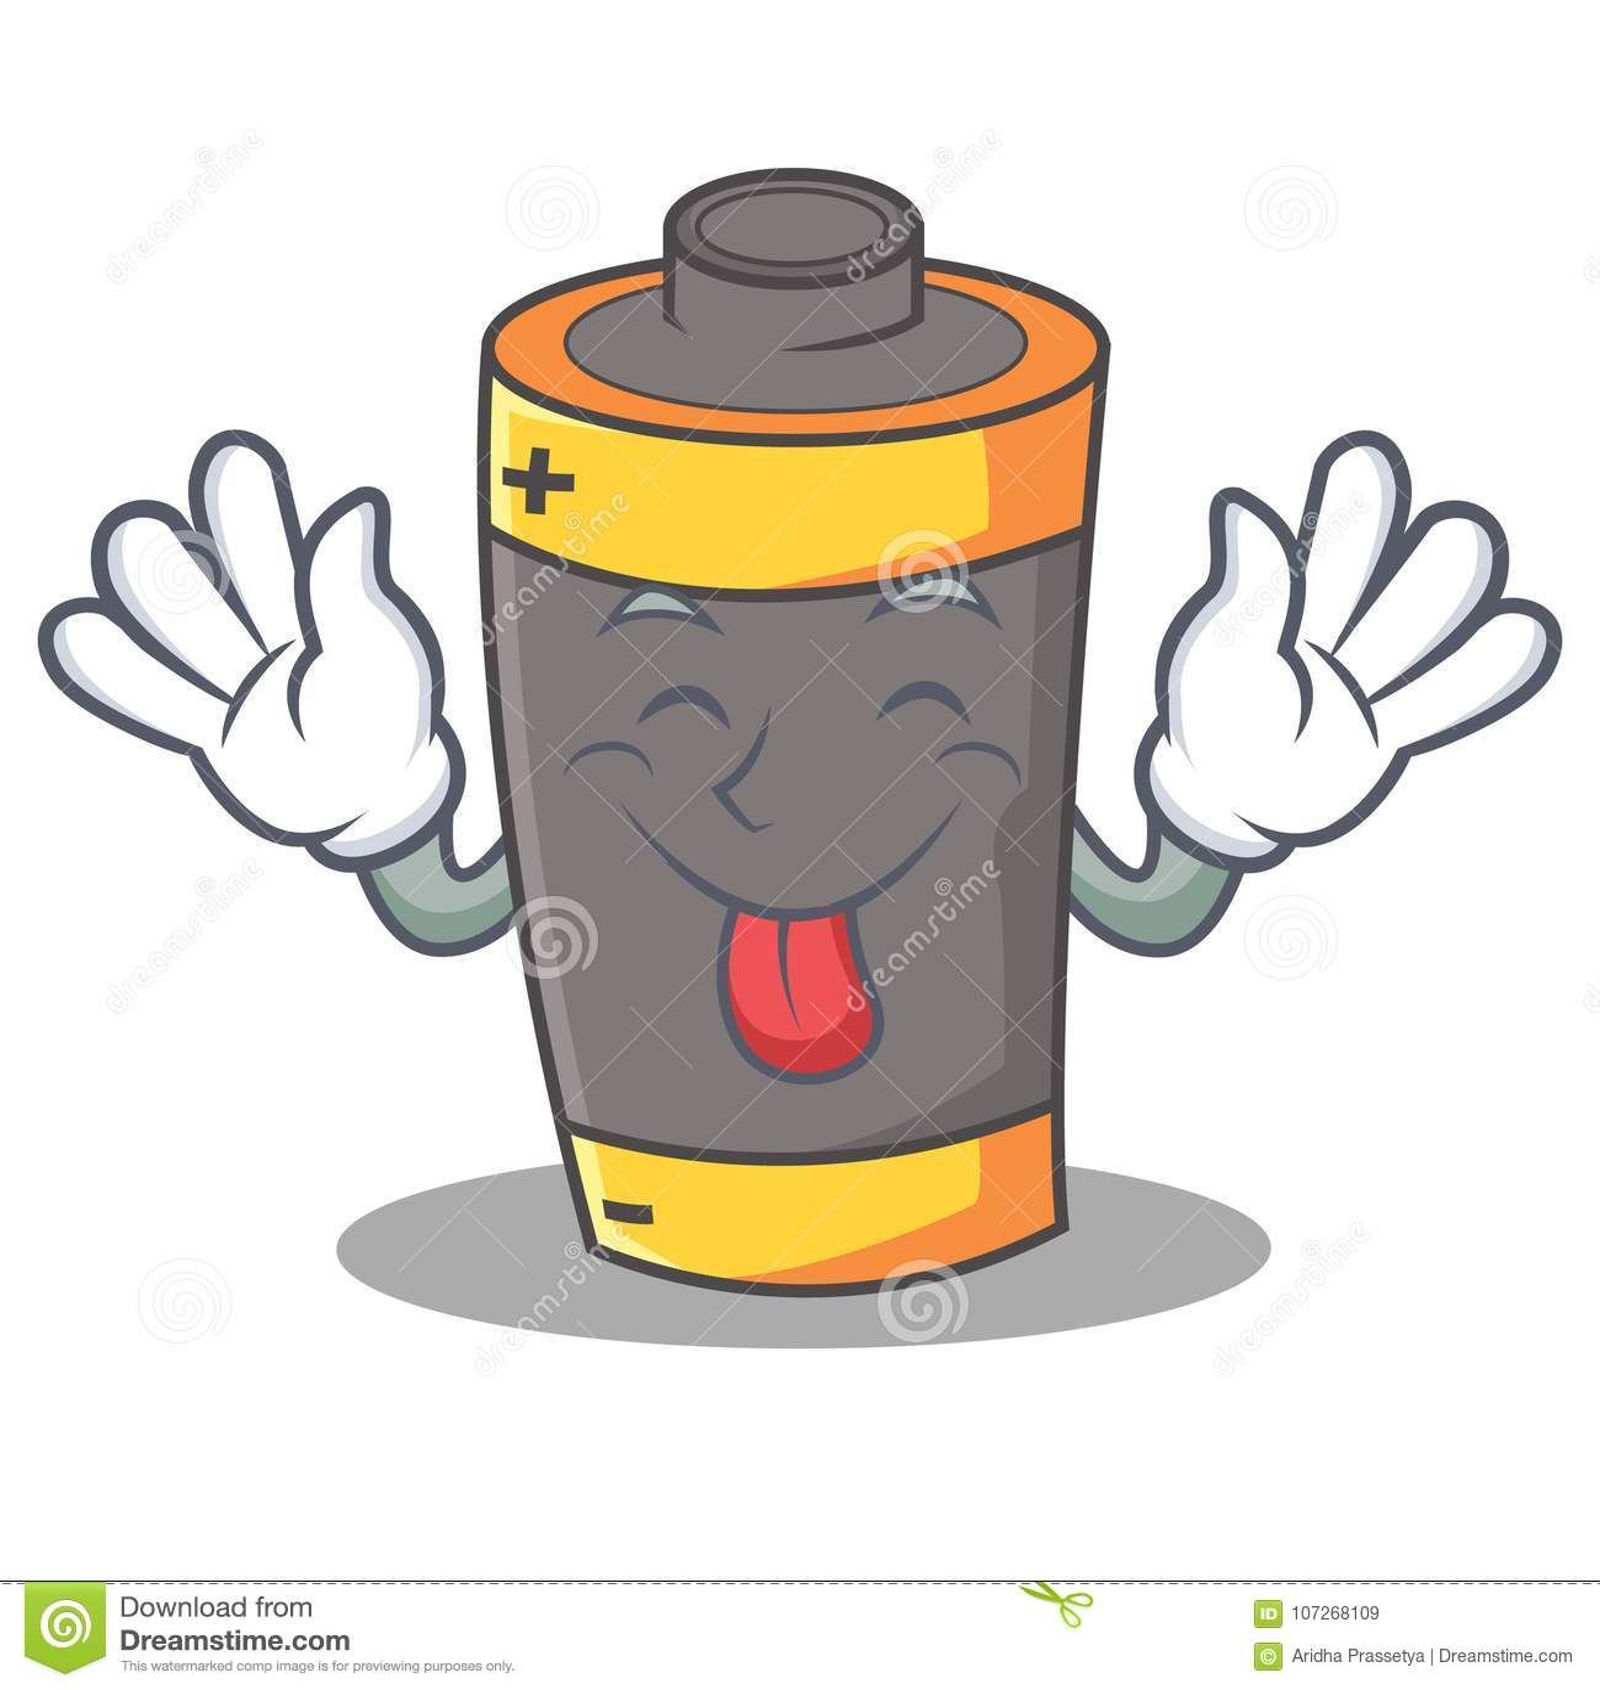 Tongue out battery mascot cartoon style